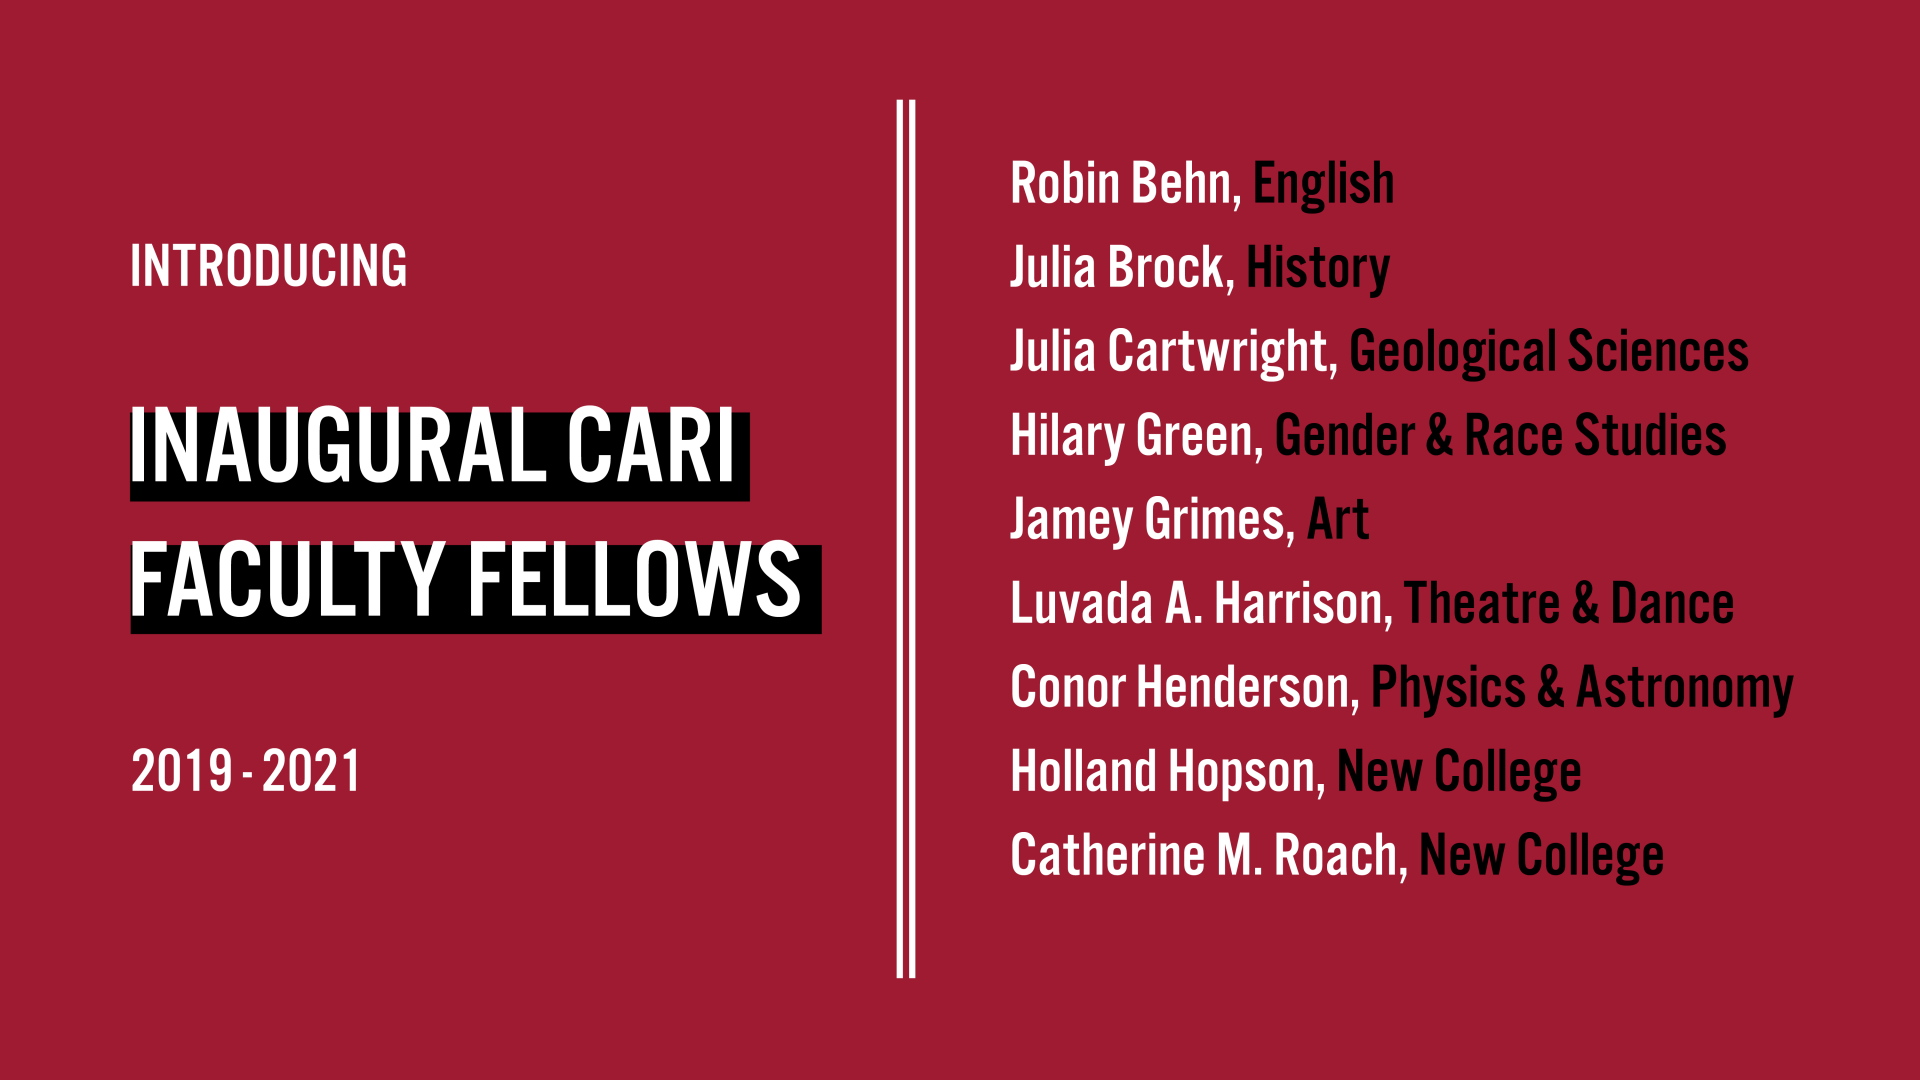 CARI Faculty Fellows